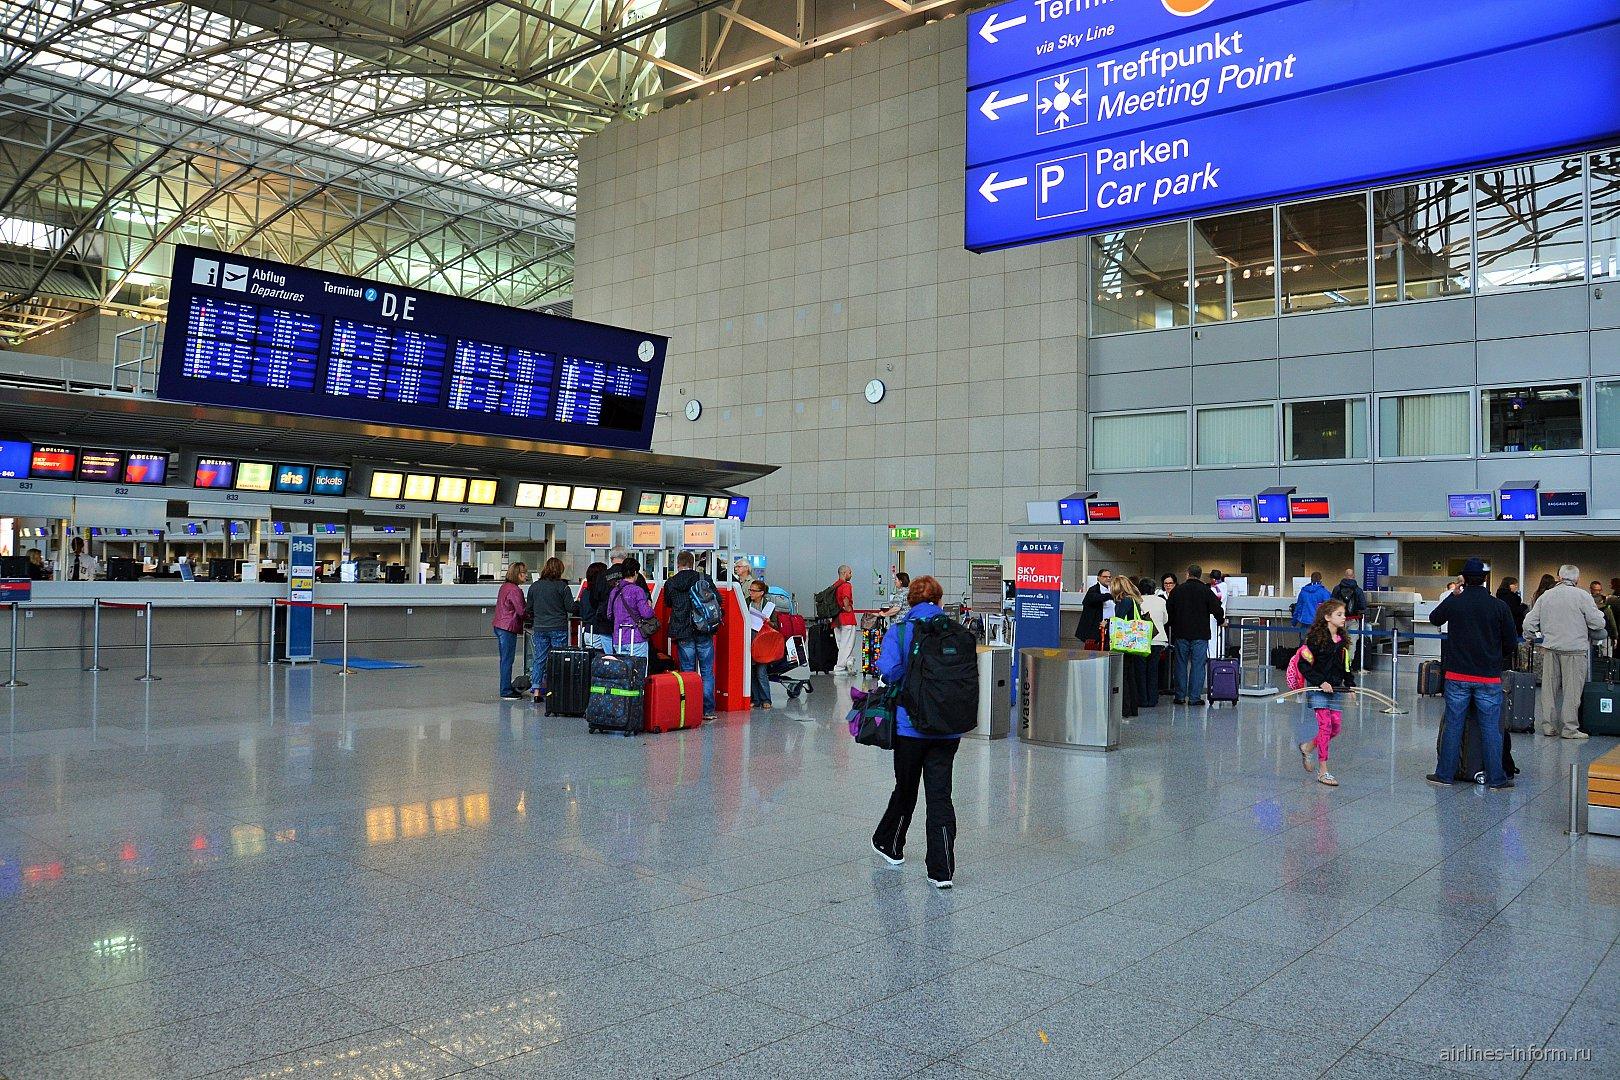 В терминале 2 аэропорта Франкфурт-на-Майне